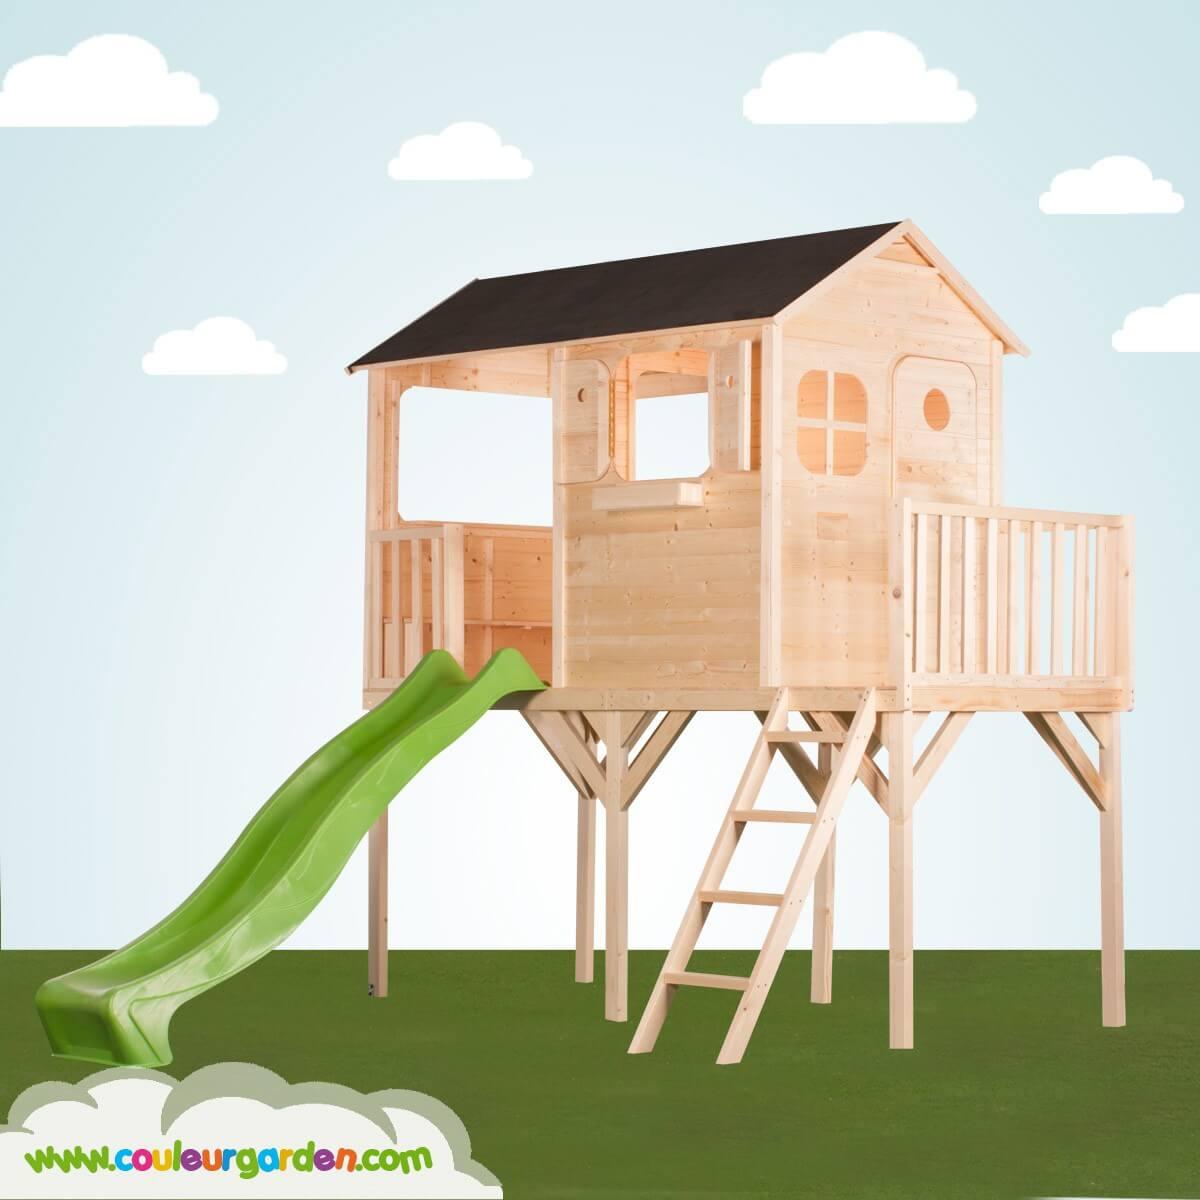 Maisonnette bois toboggan lekingstore maisonnette enfant wooden play house maisonnette en bois - Cabane enfant toboggan ...